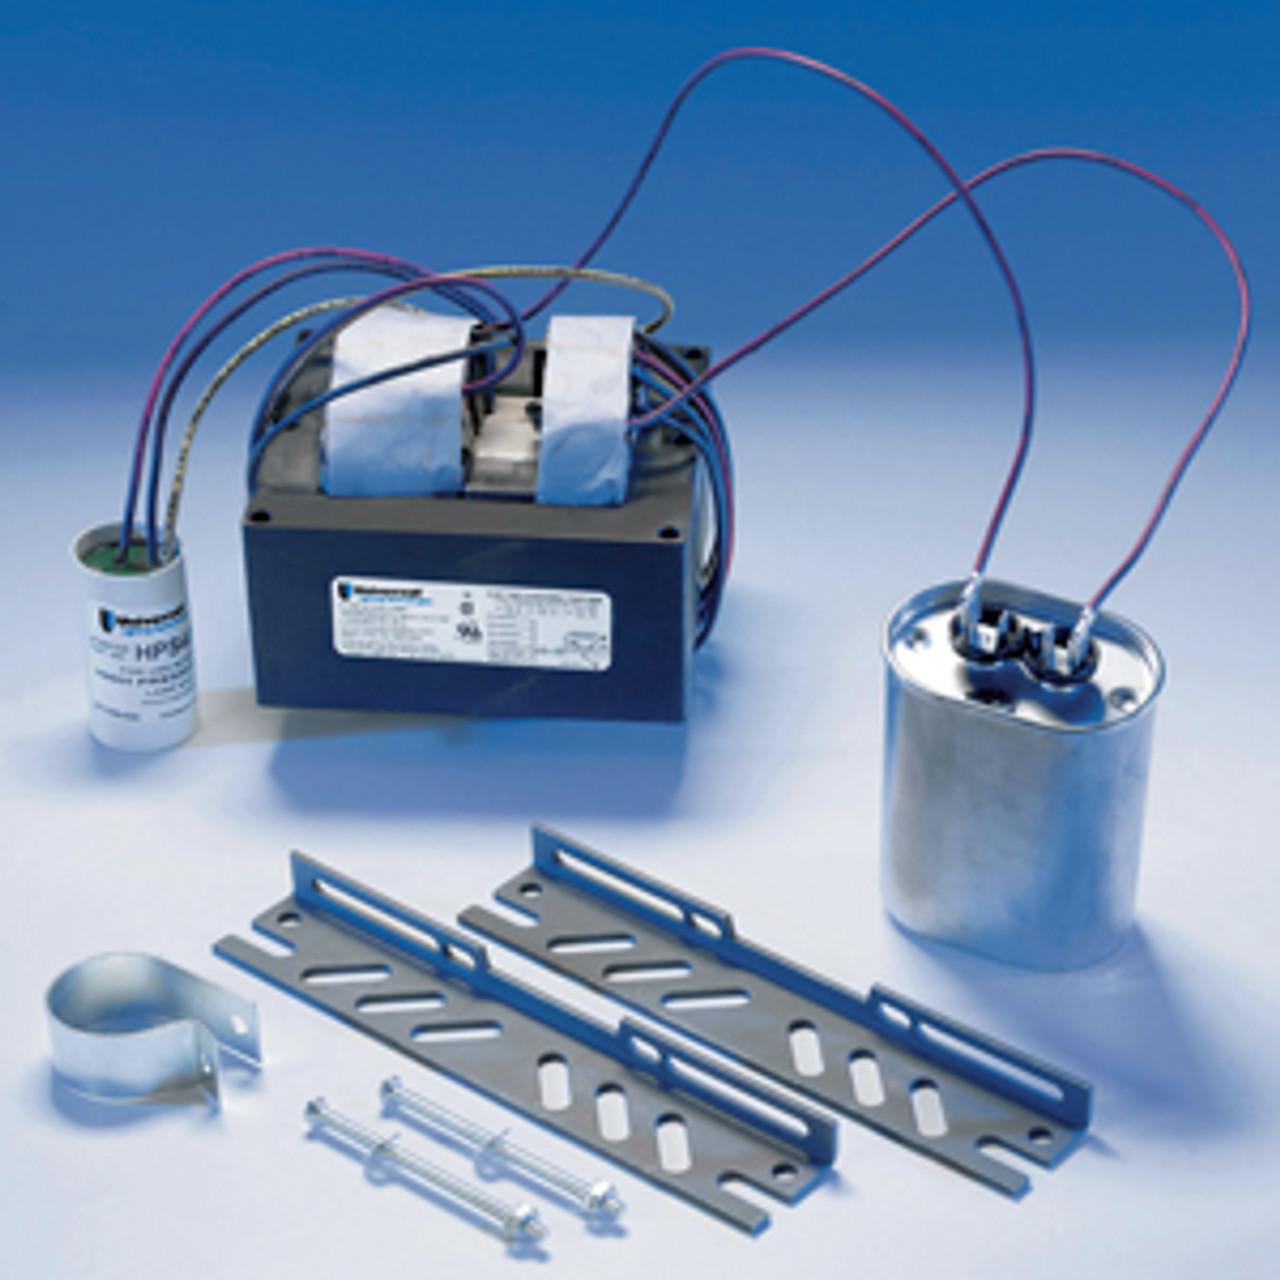 New GE 70 Watt High Pressure Sodium Multi-Volt Lighting Ballast Kit 1